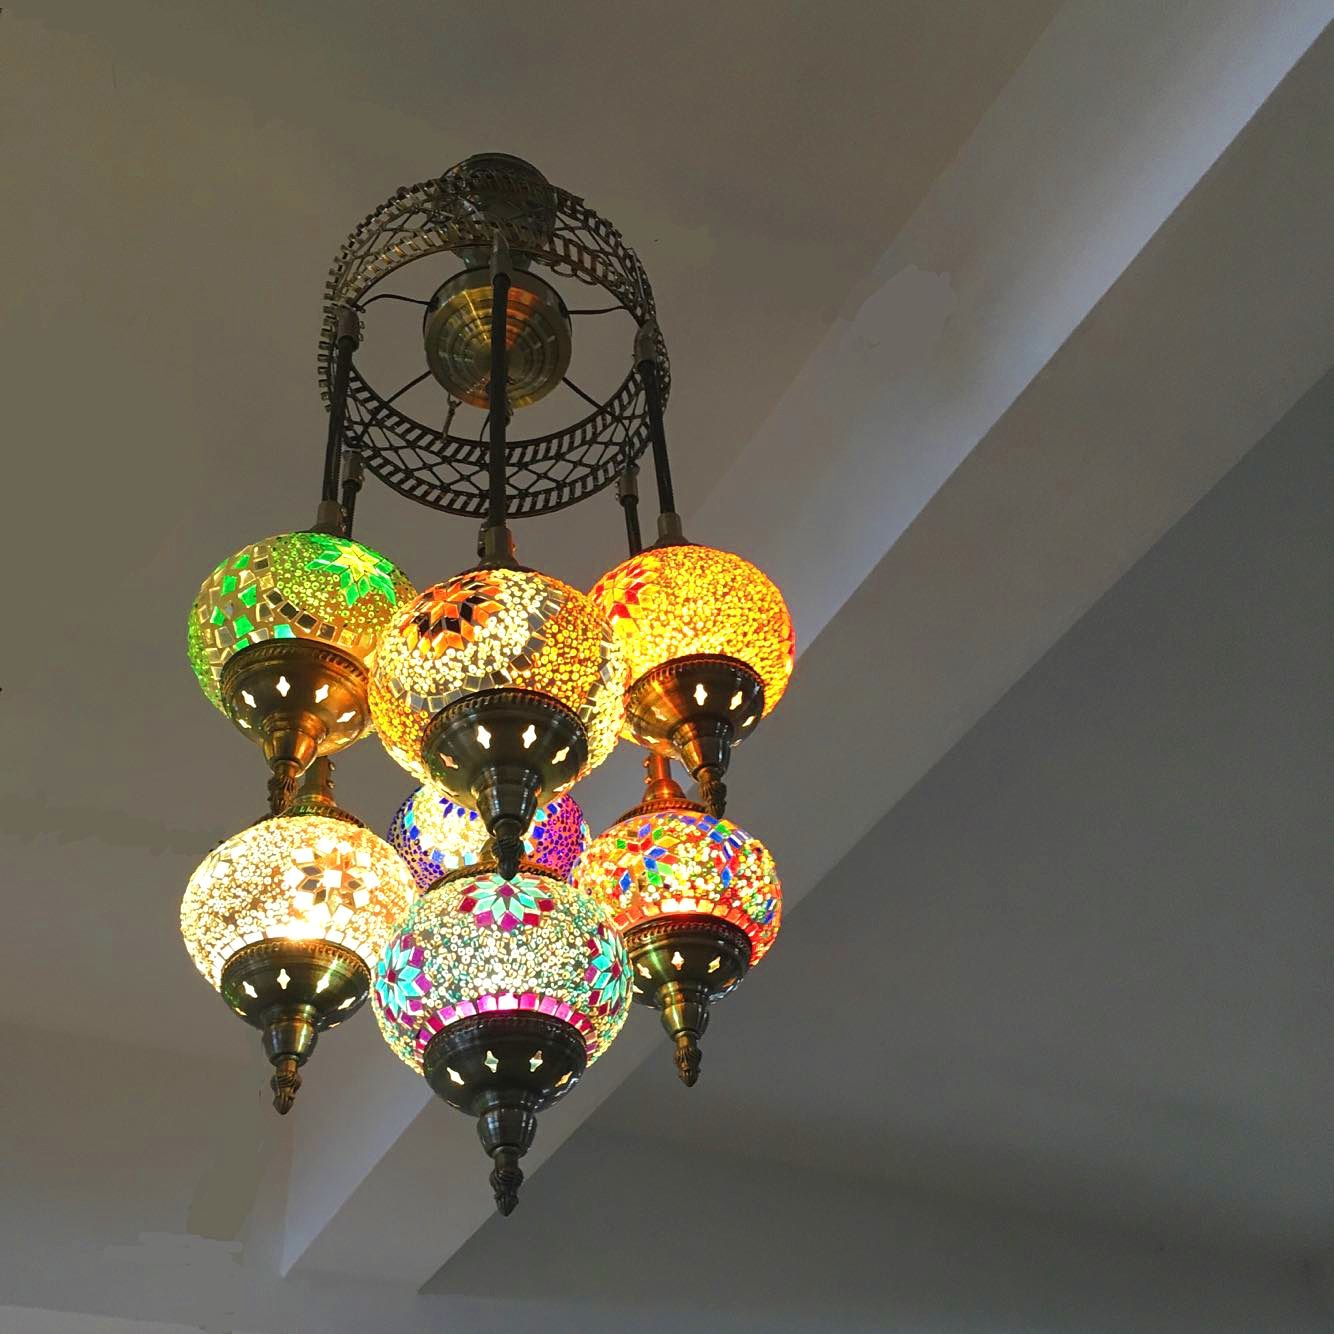 Turkse Marokkaanse Hanglamp Handgemaakte Mozaiek Gebrandschilderde Gang Trappenhuis Cafe Restaurant Opknoping Licht Lamp Turkse Lampen Lampen Hangende Lichten